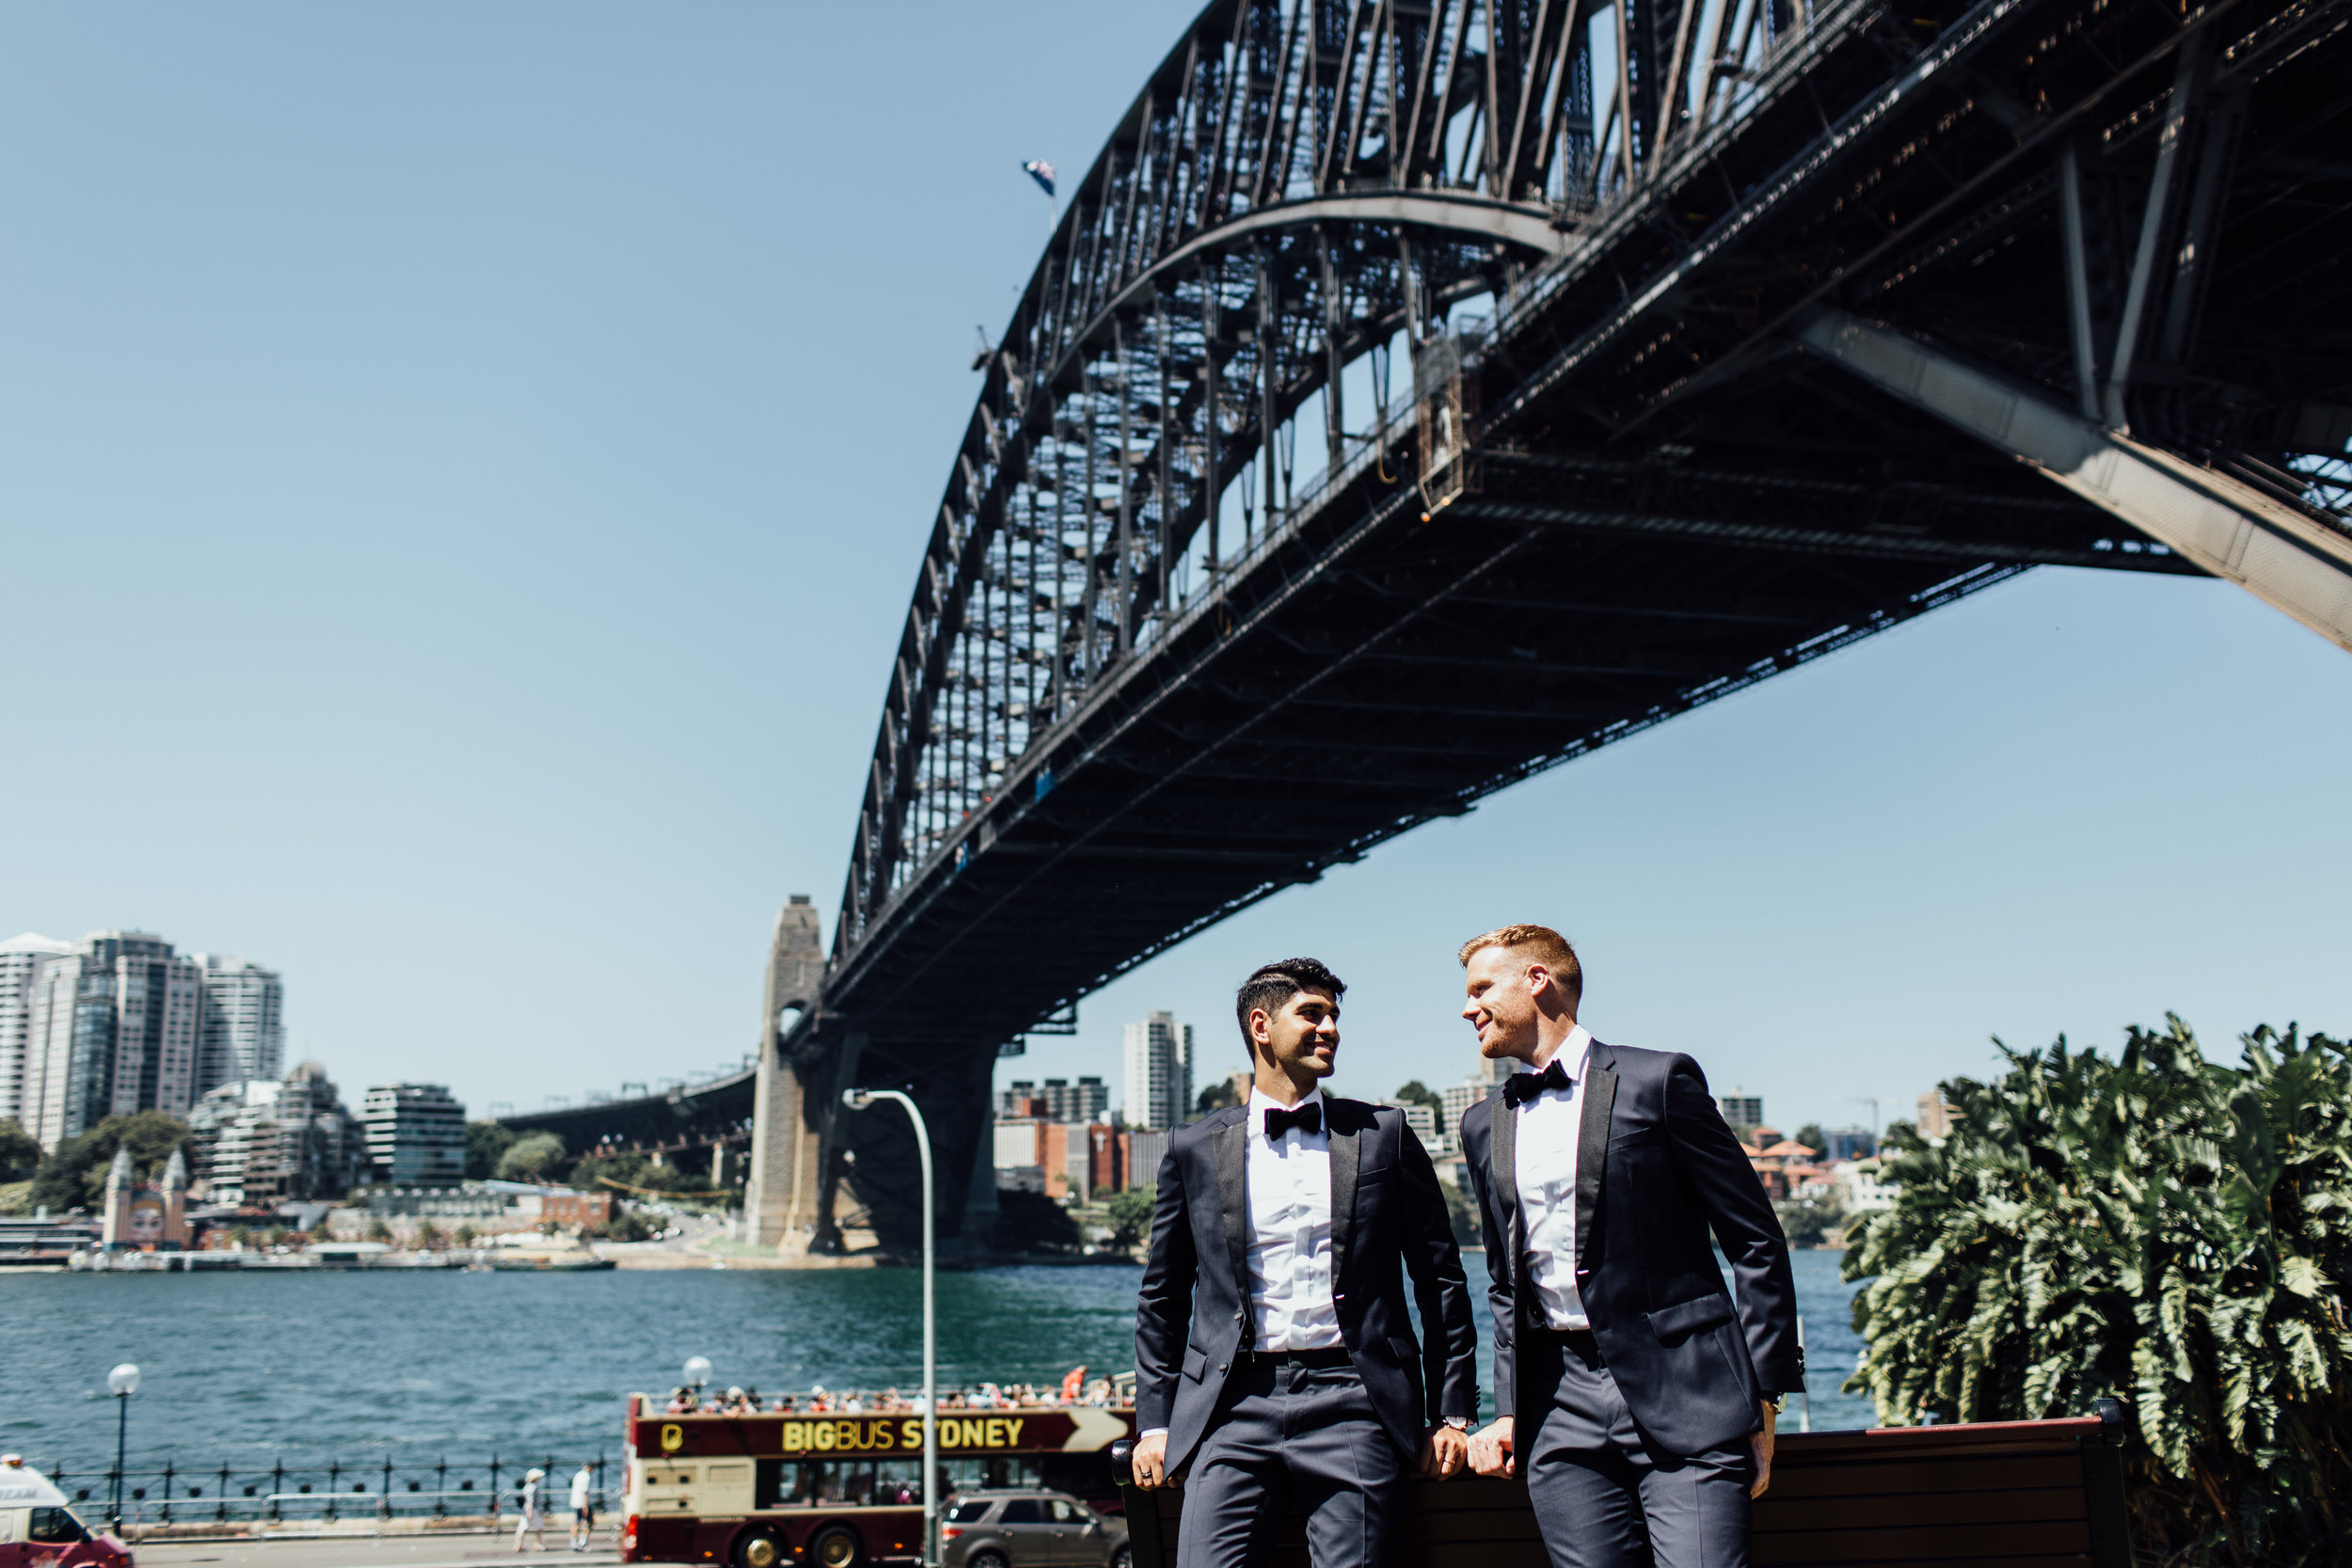 Stephen&David-Wedding-106.jpg